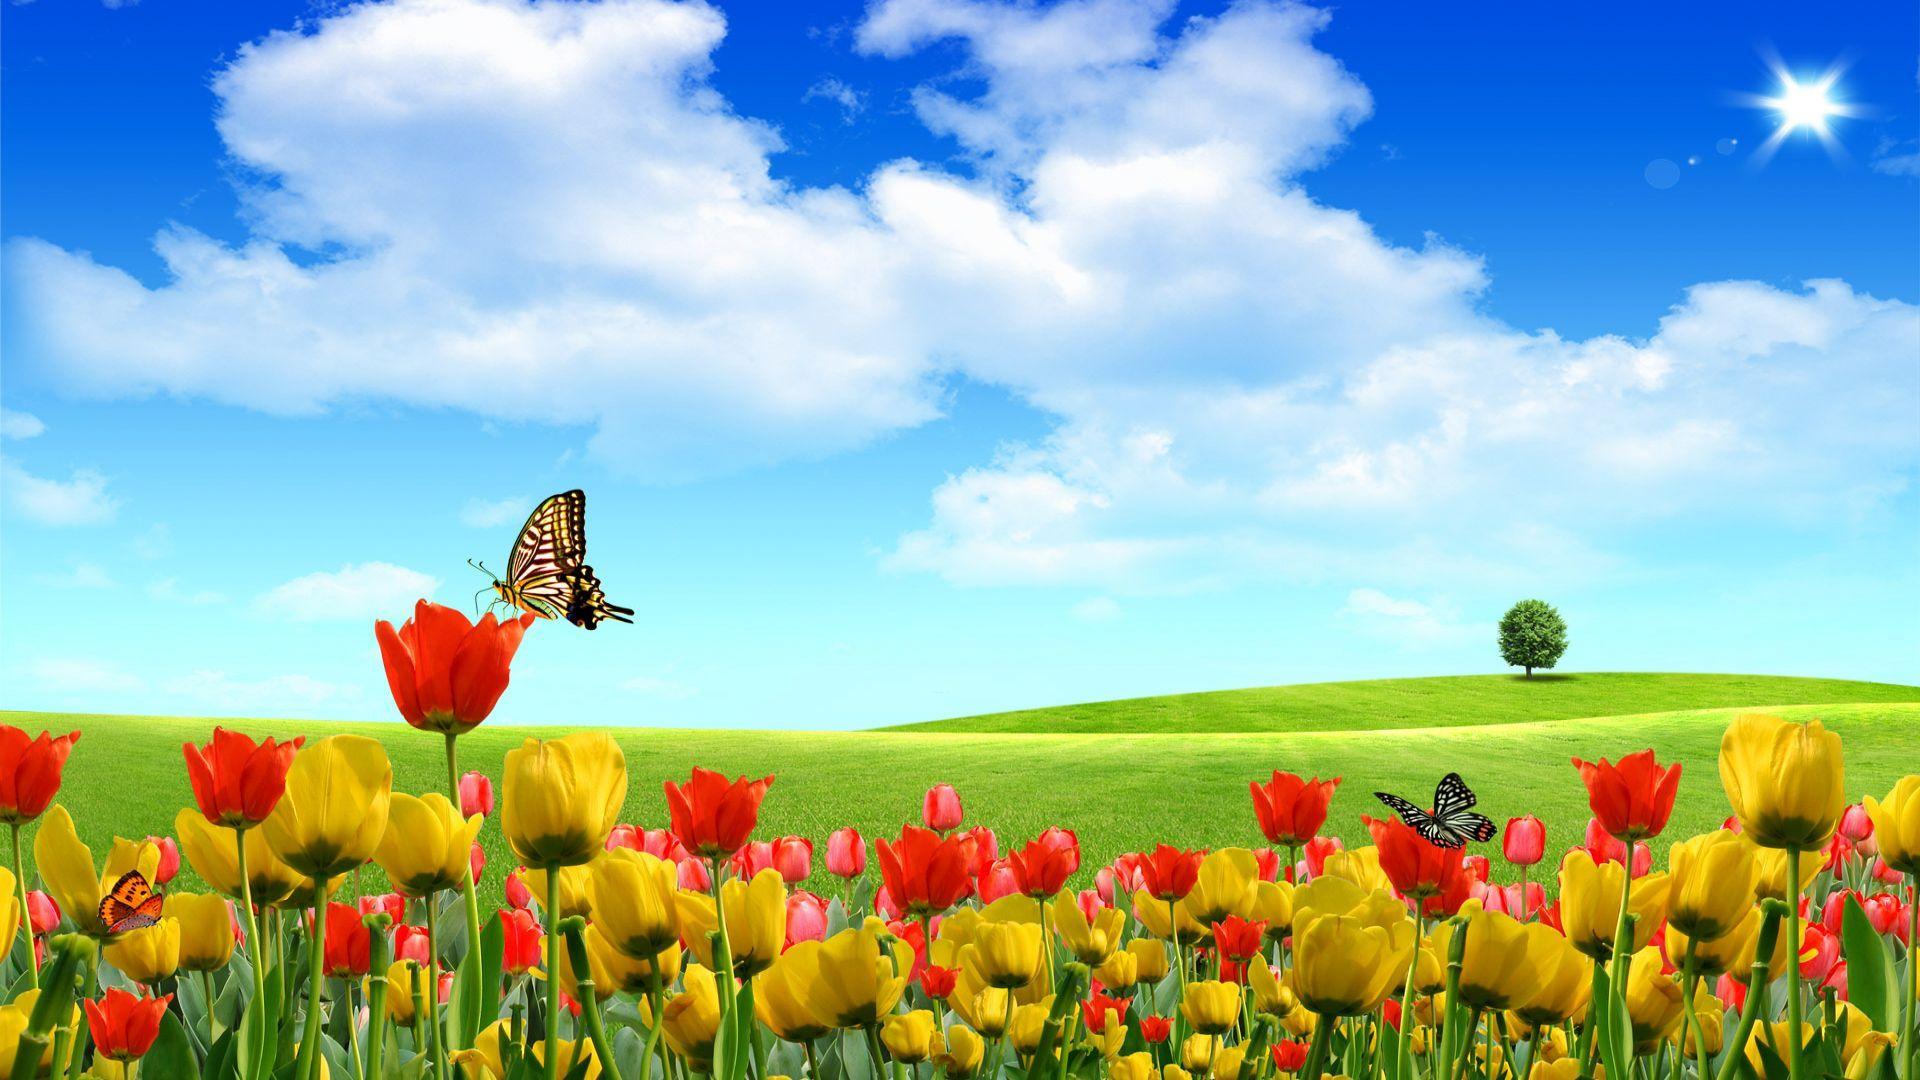 Good Wallpaper High Quality Scenery - 76c16bf90a0234f9924bafb06127ef82  You Should Have_217844.jpg